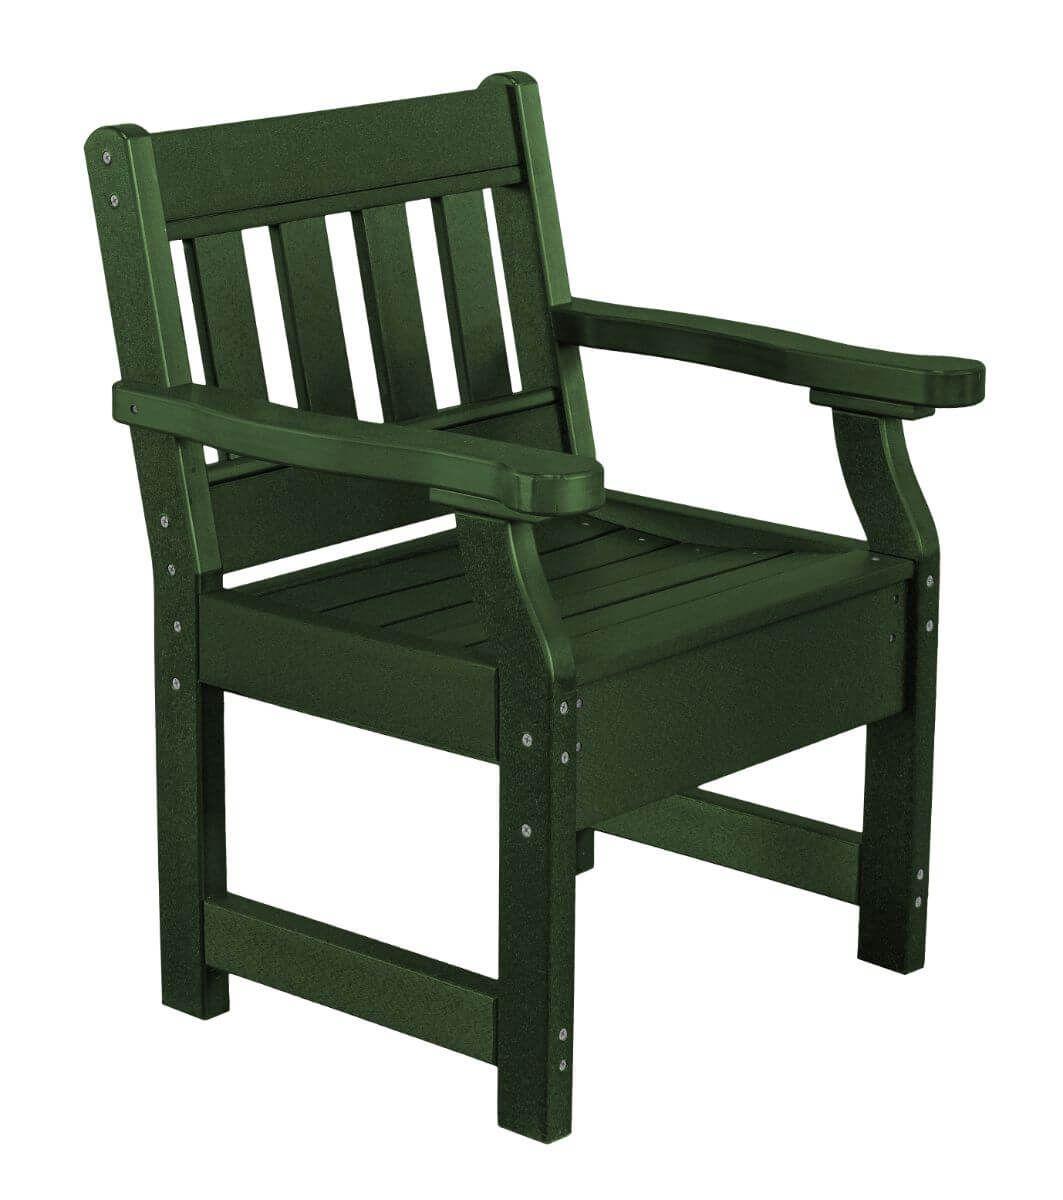 Turf Green Aden Patio Chair